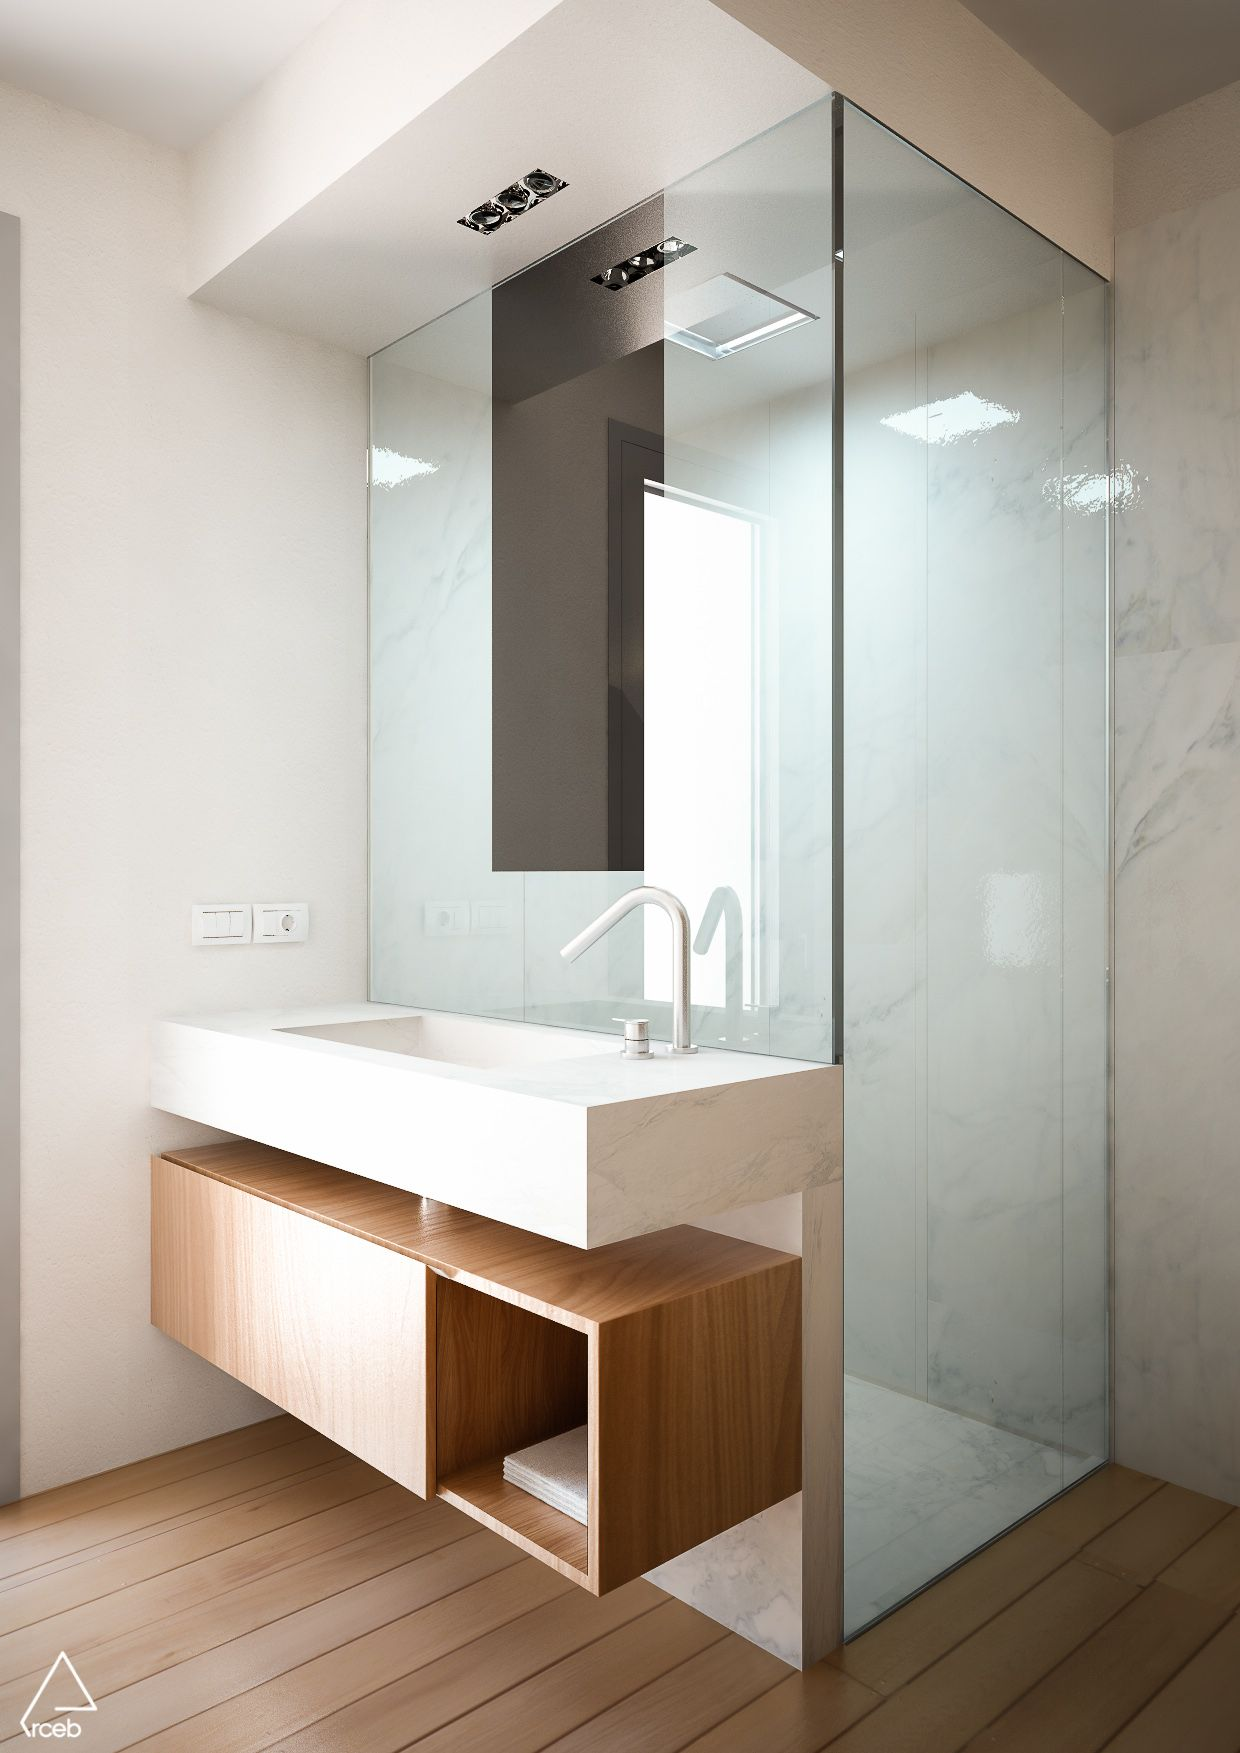 COCOON bathroom design inspiration | modern high-end stainless steel ...